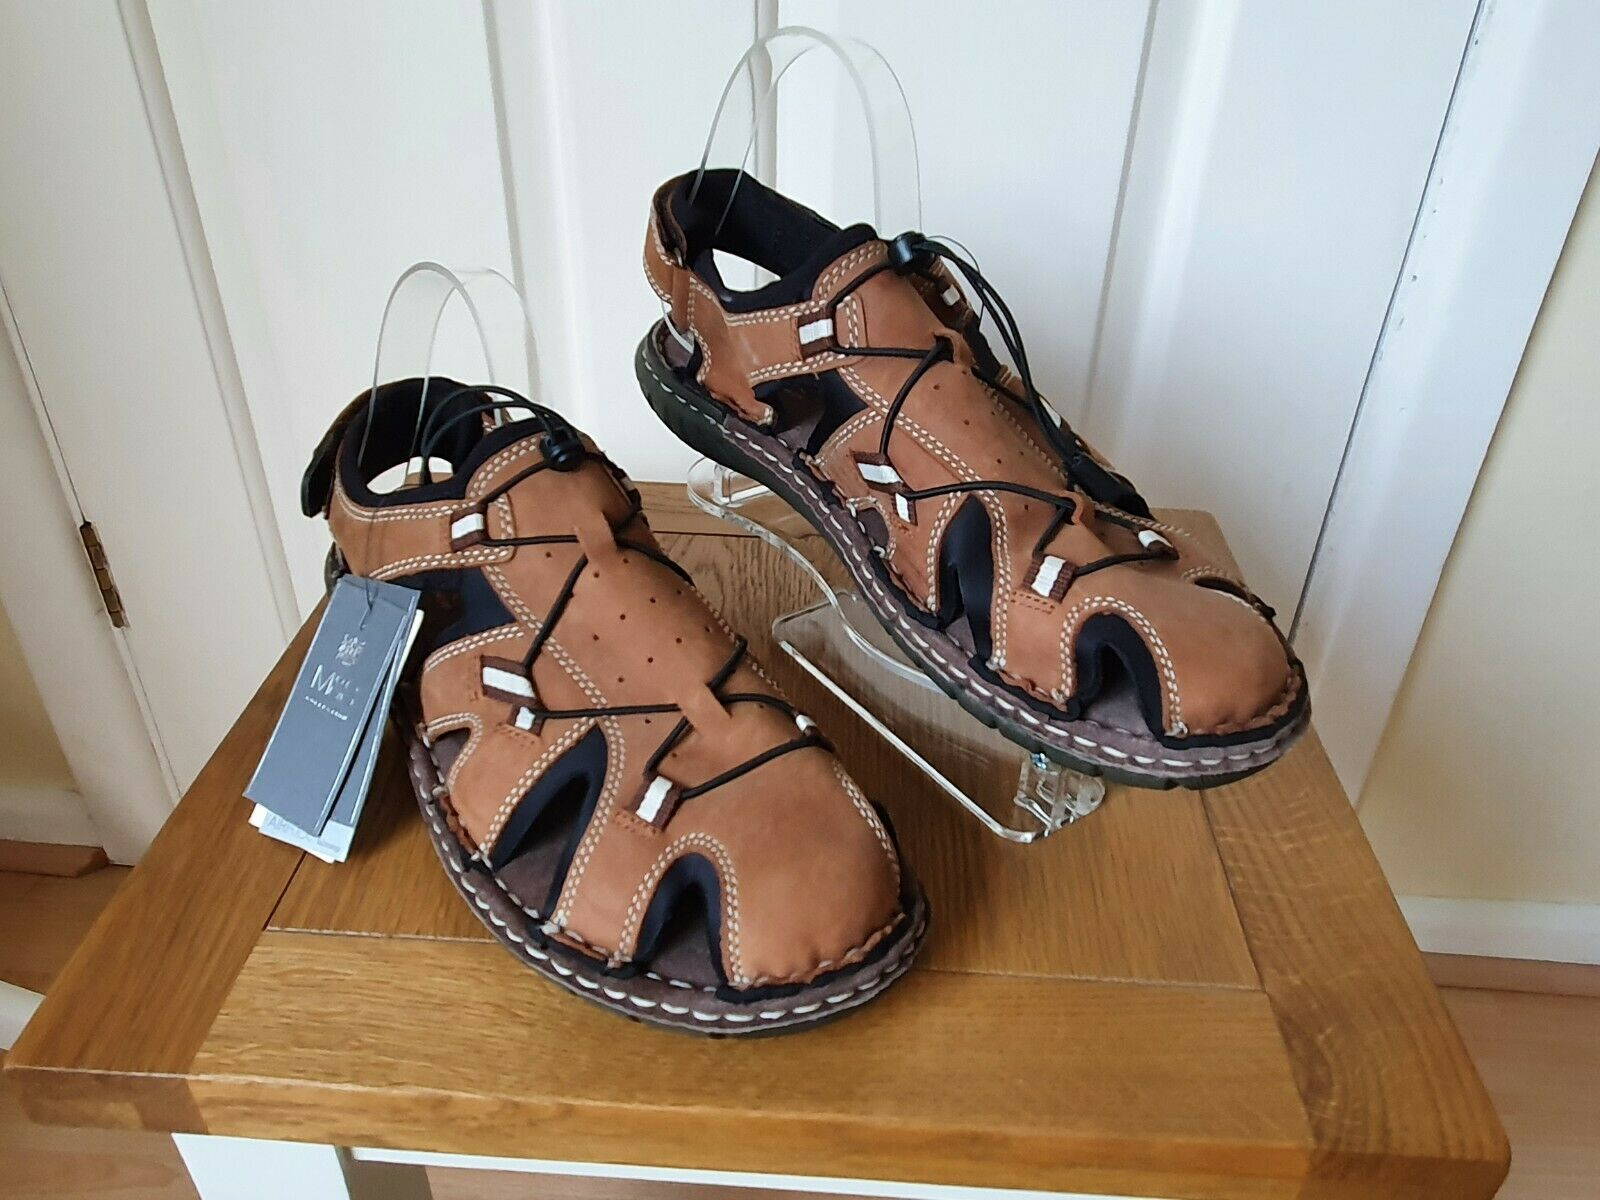 Marks & Spencer Airflex Total Comfort BNWT New Men's Leather Sandals Size UK 10